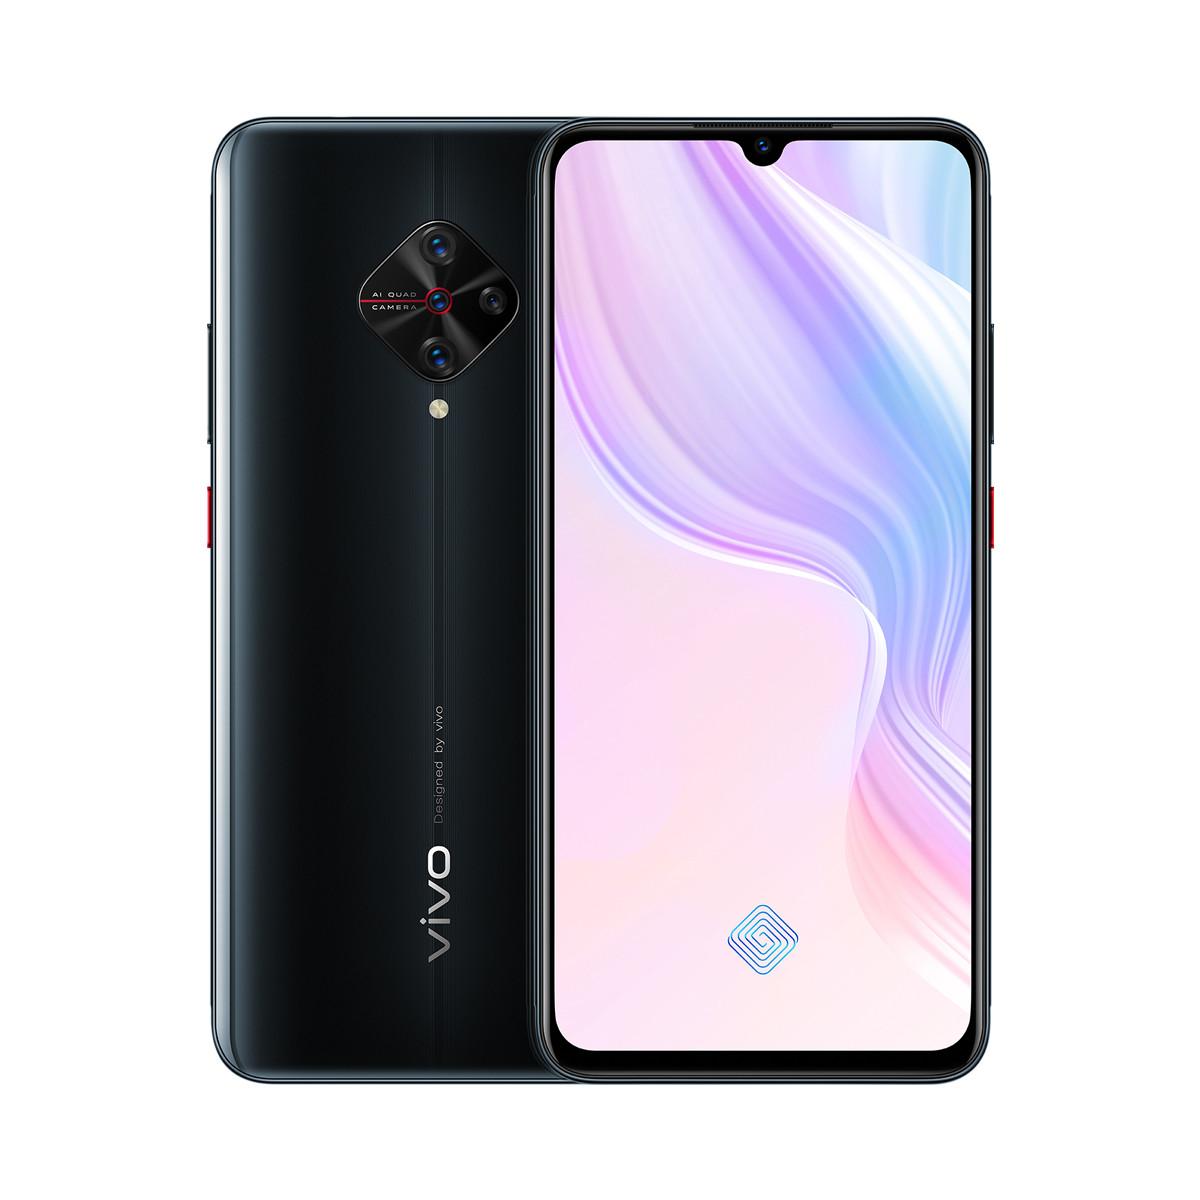 vivoY9S 大屏大电池全网通美颜拍照手机Y9s-128G-8G-琉璃黑